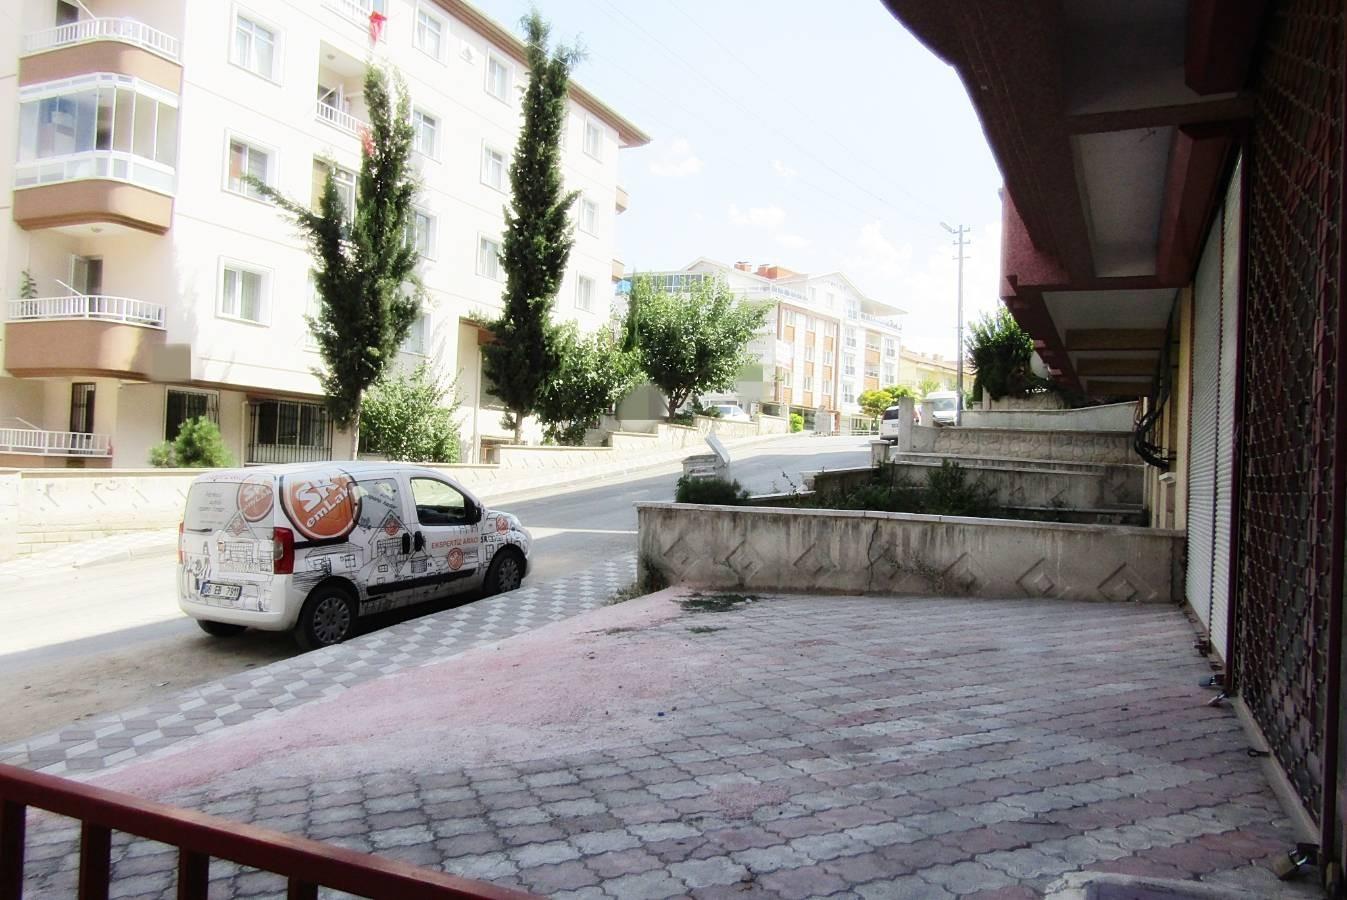 SR EMLAK'TAN PİYADE MAH'DE 30m² ULAŞIMA YAKIN DÜKKAN